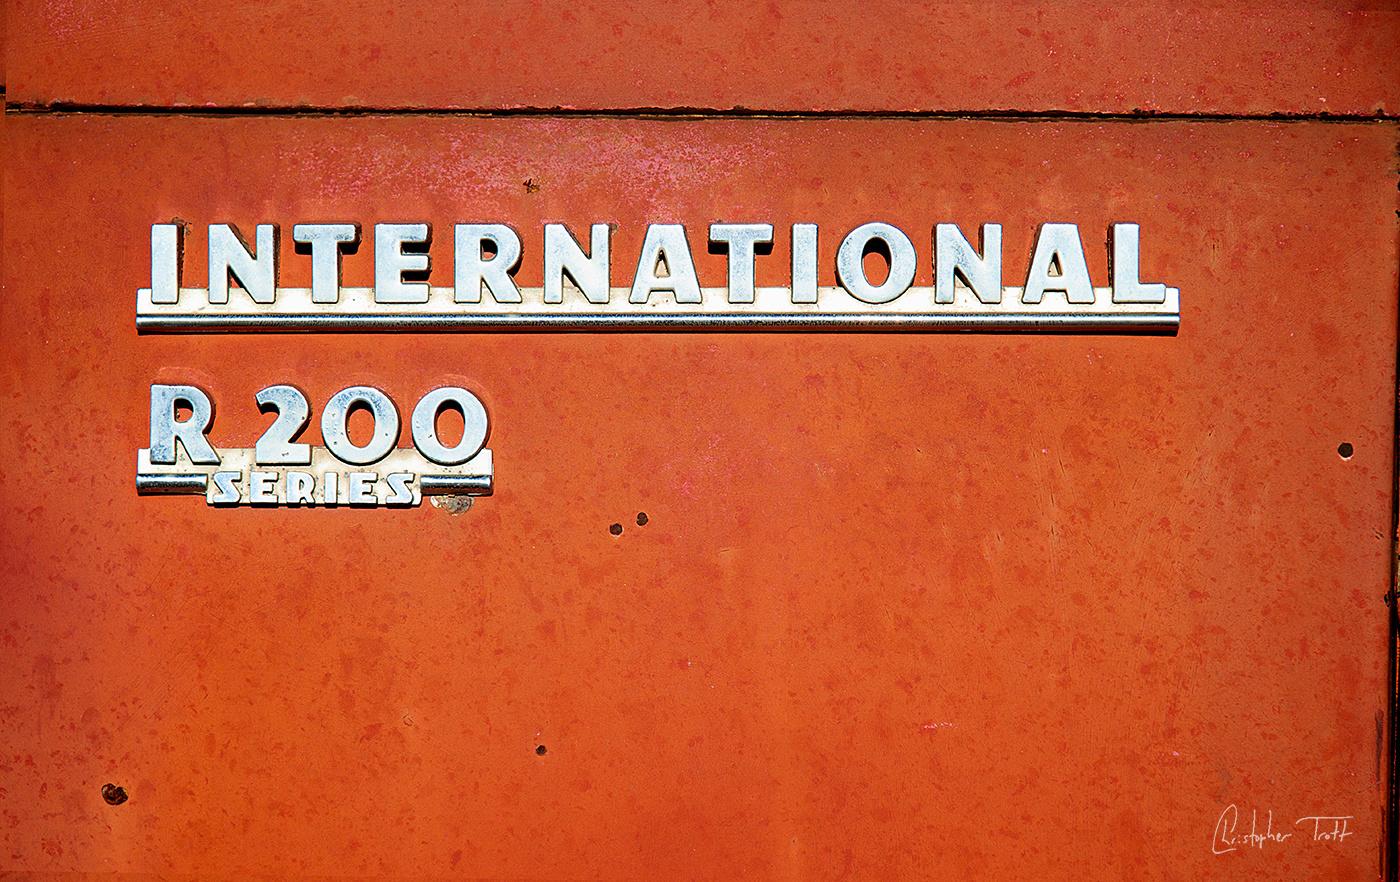 International R200